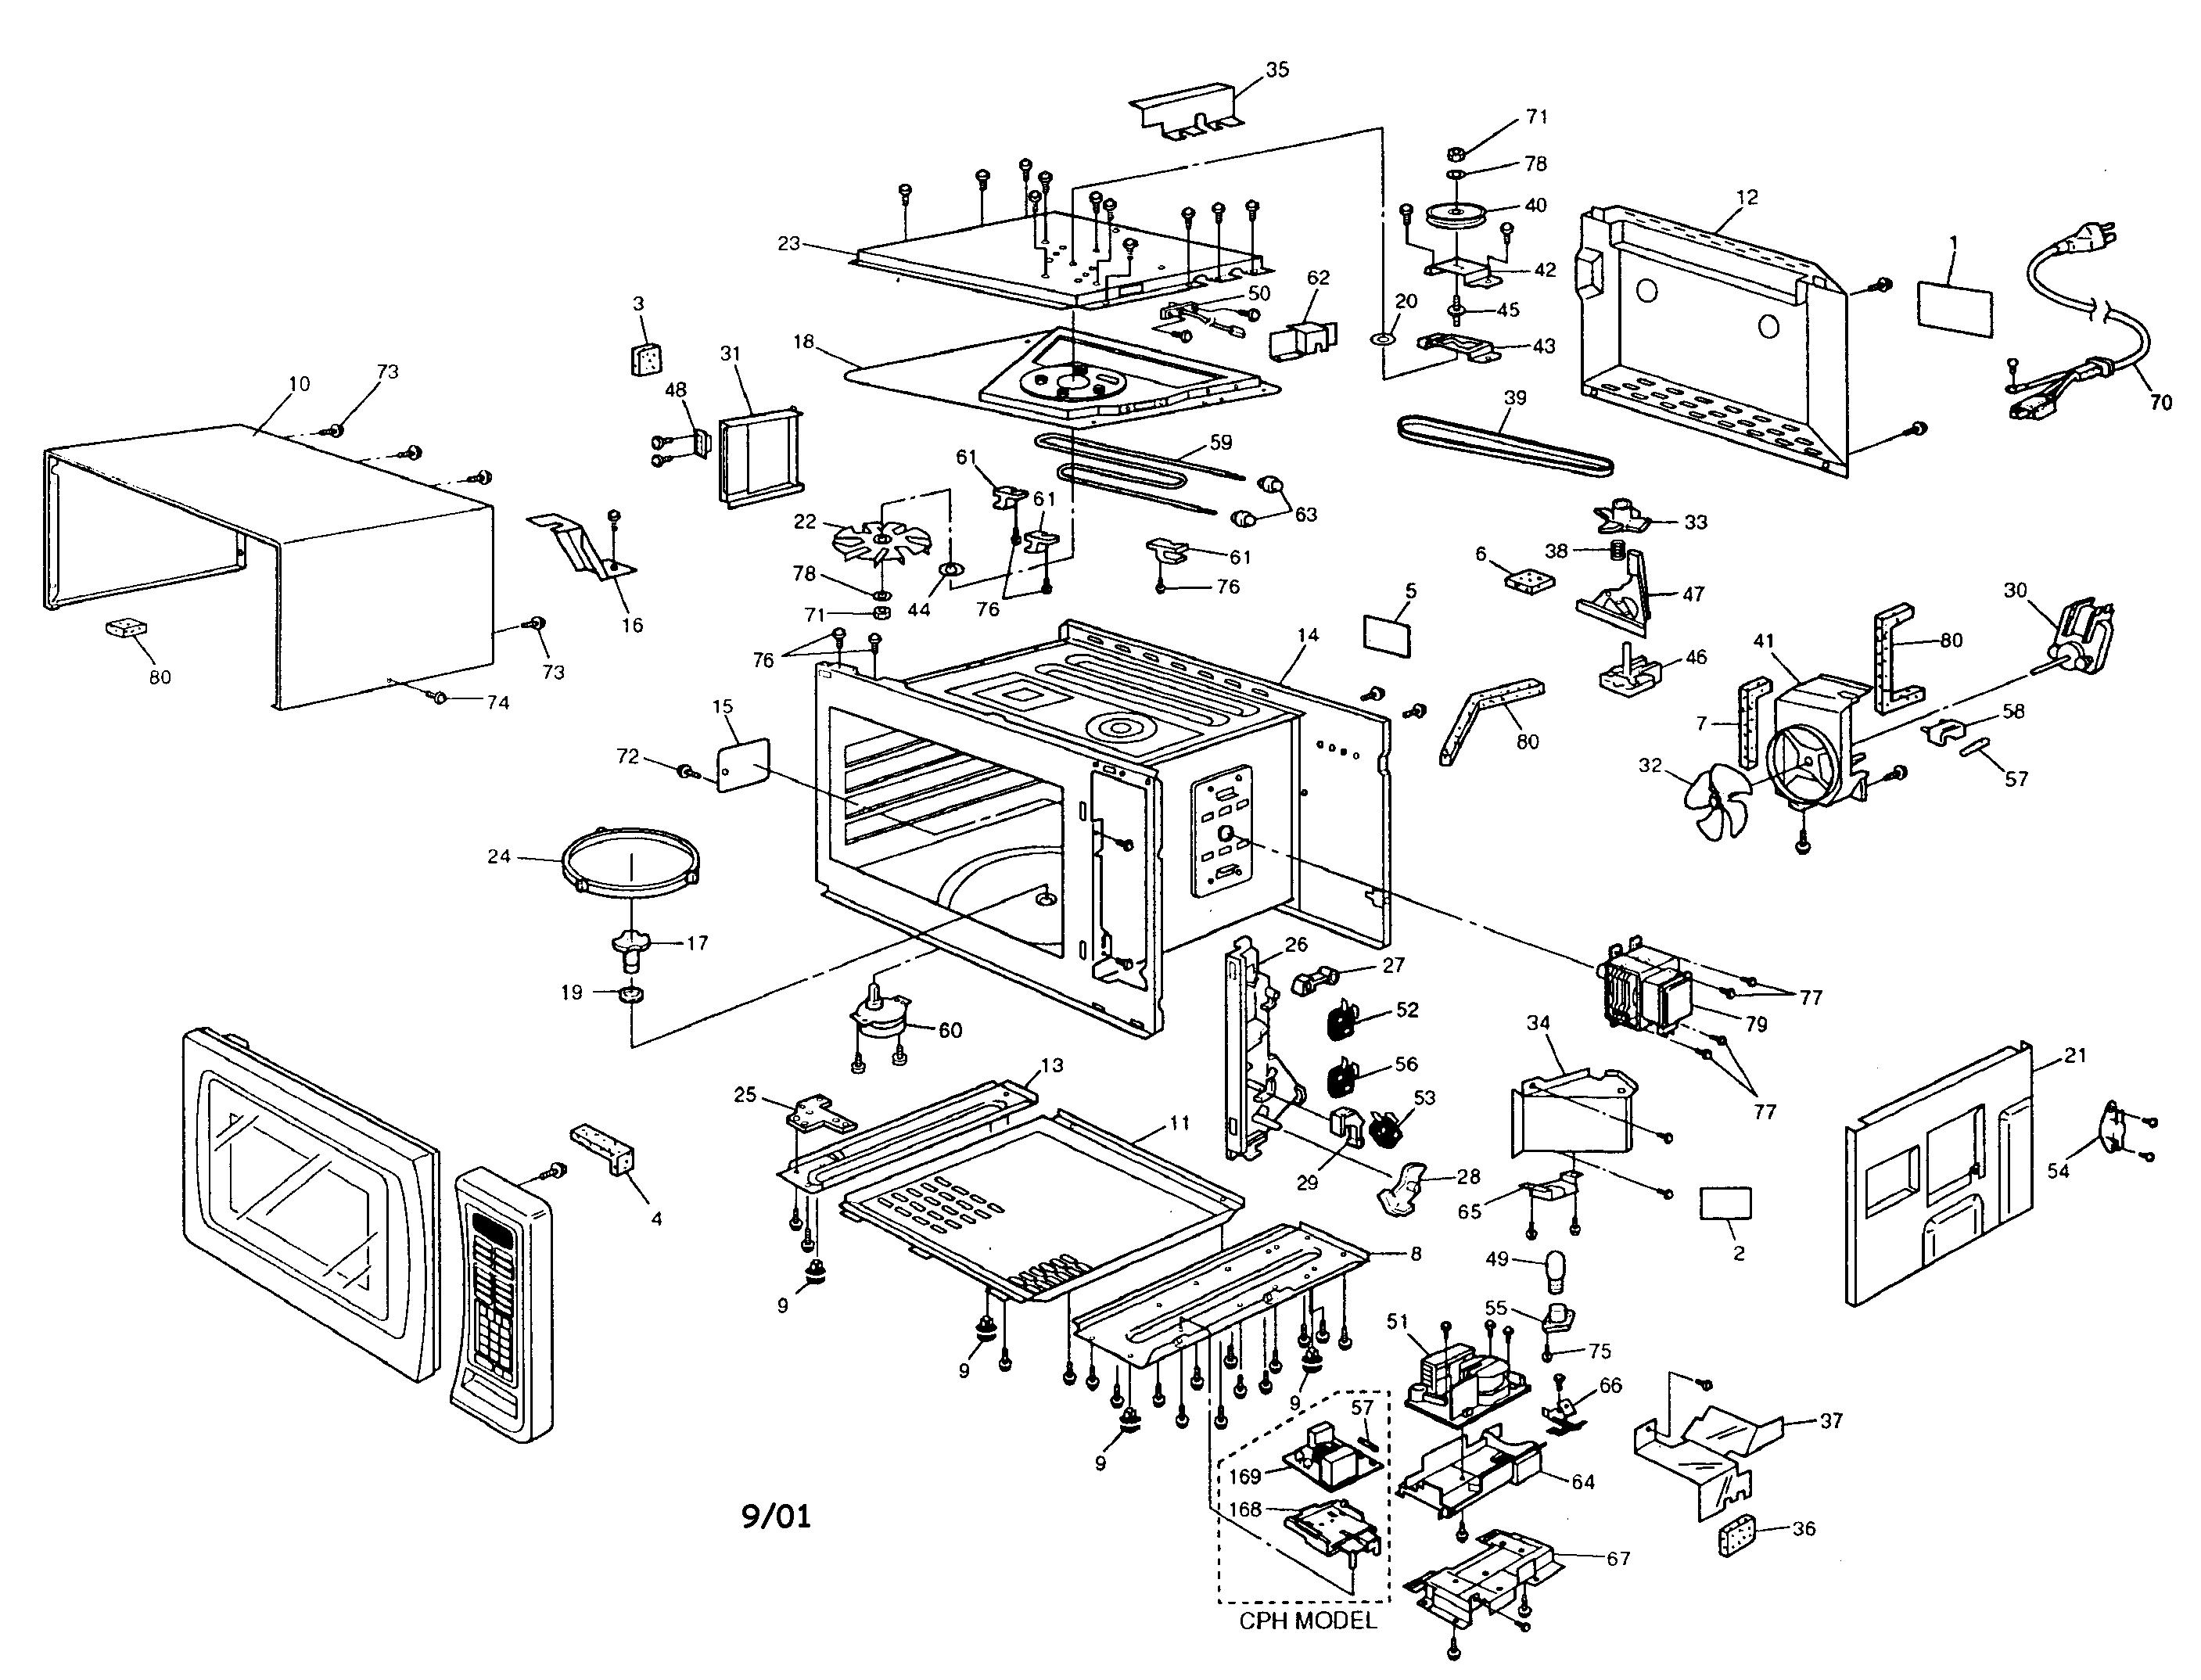 Panasonic Microwave Parts Manual  U2013 Bestmicrowave